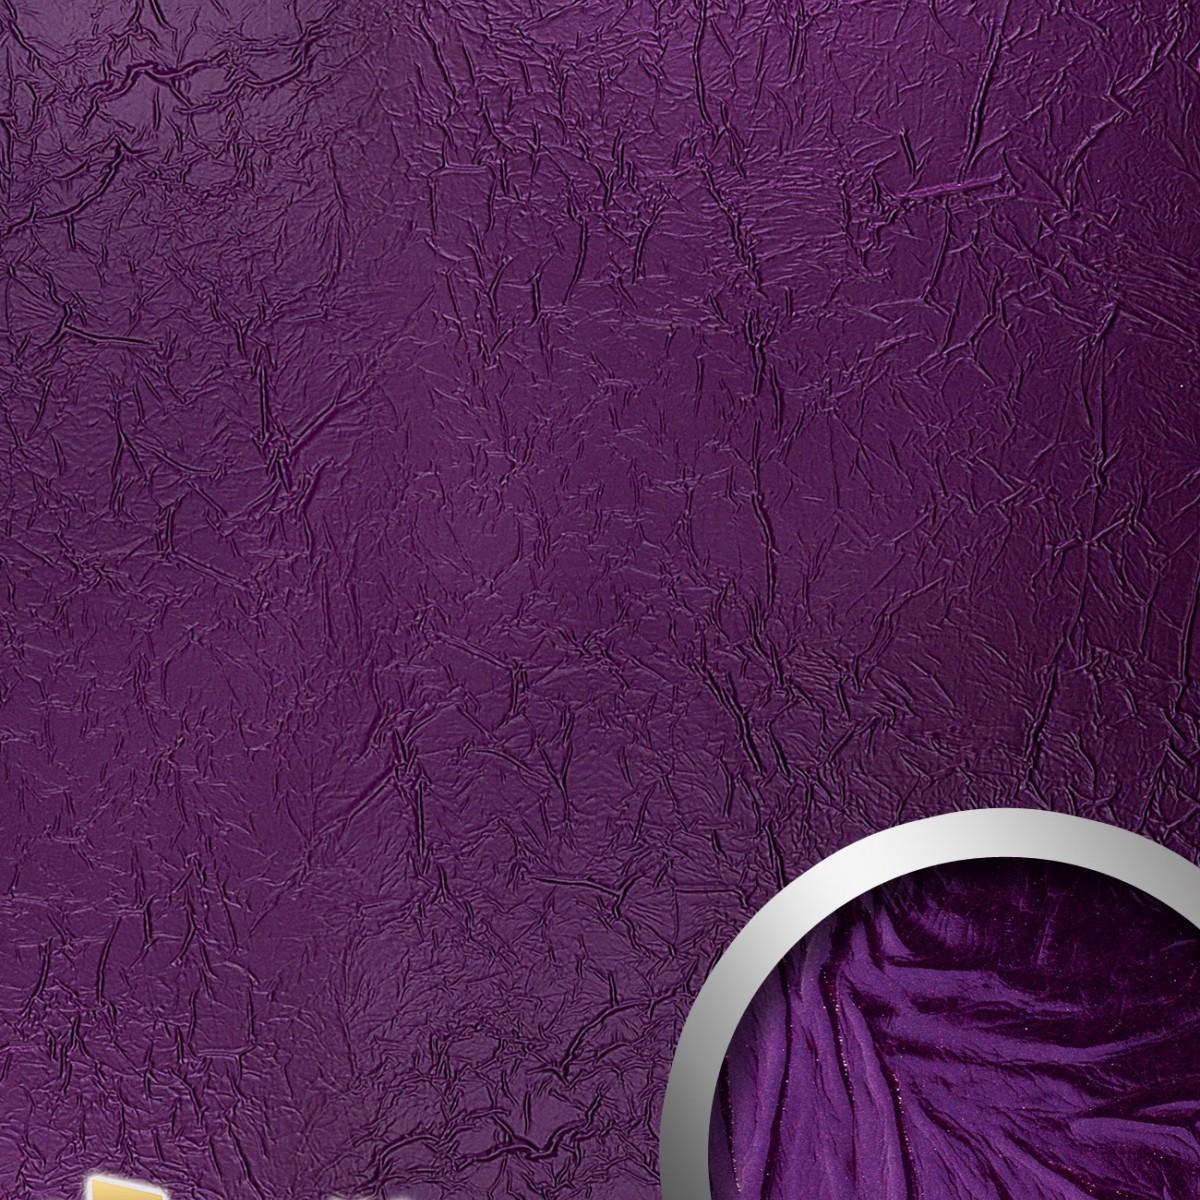 Panou decorativ LEATHER 14318, WallFace, autocolant